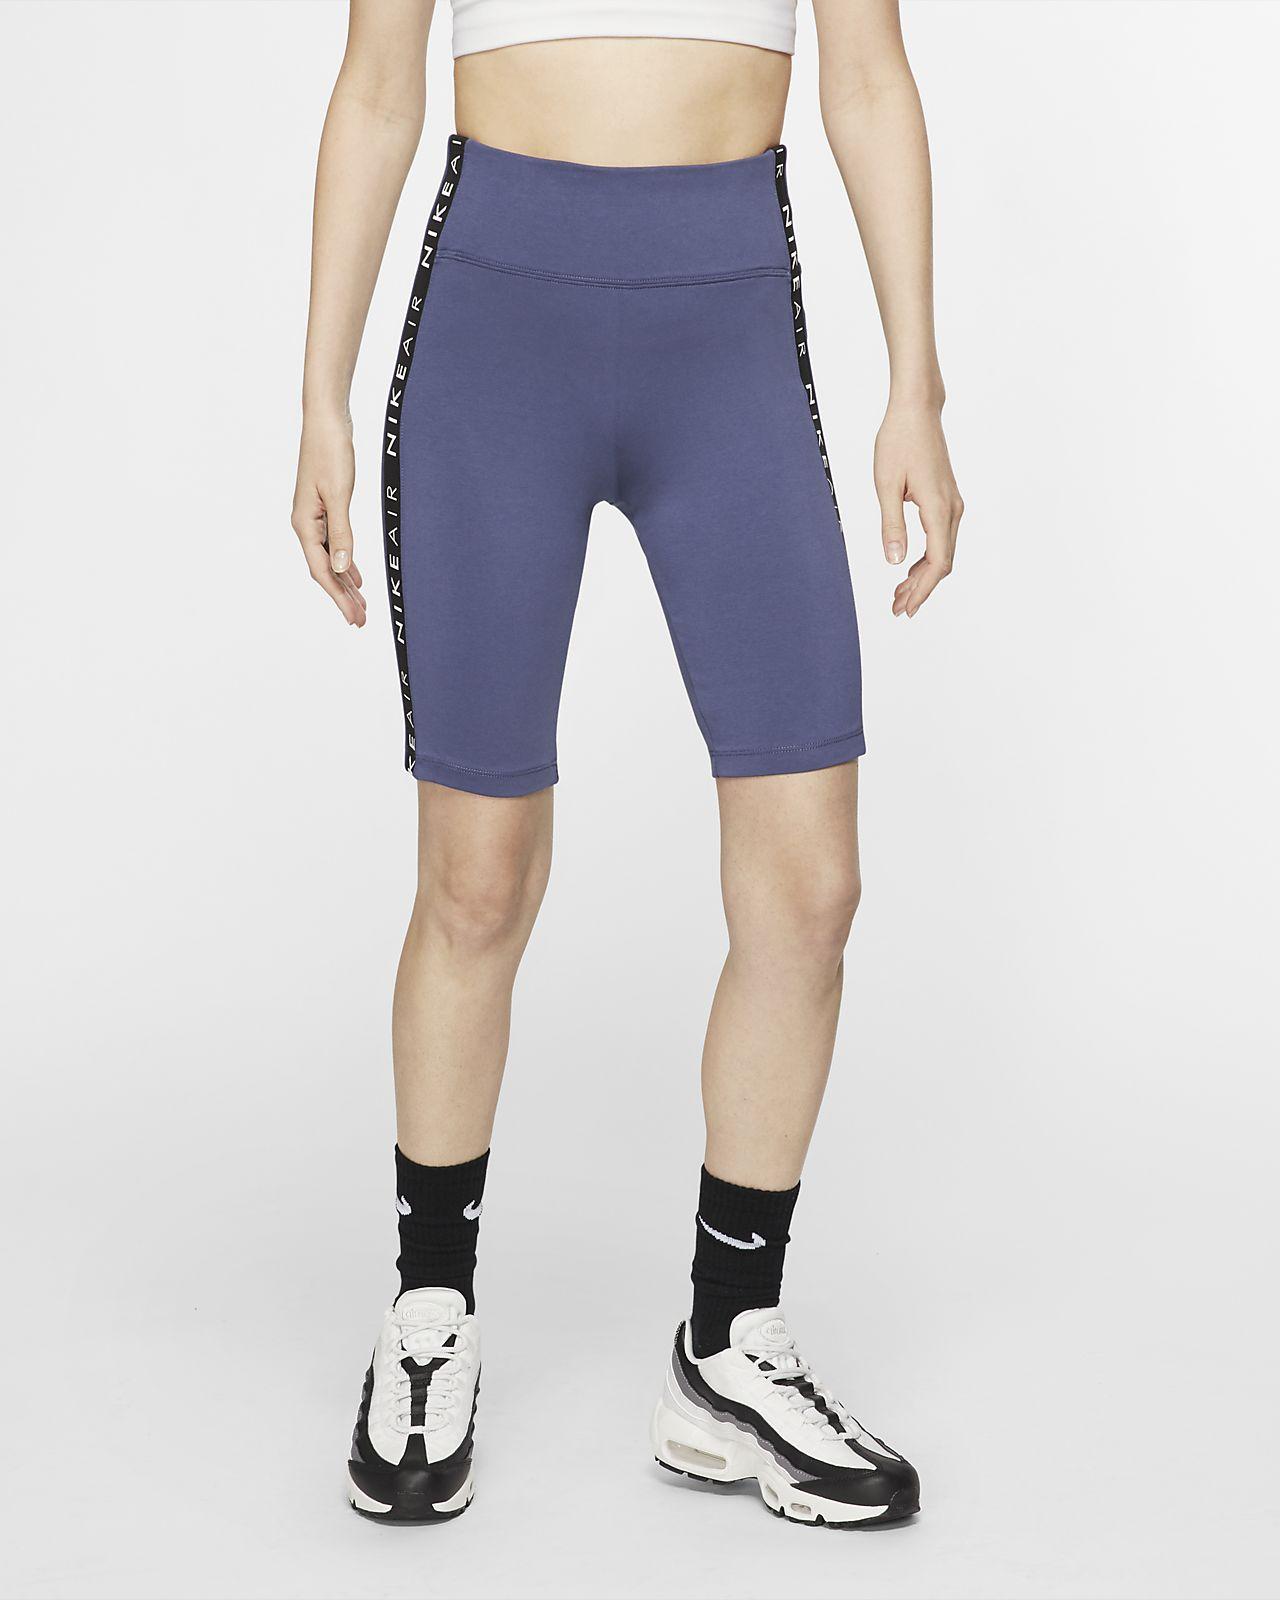 nike cycling pants